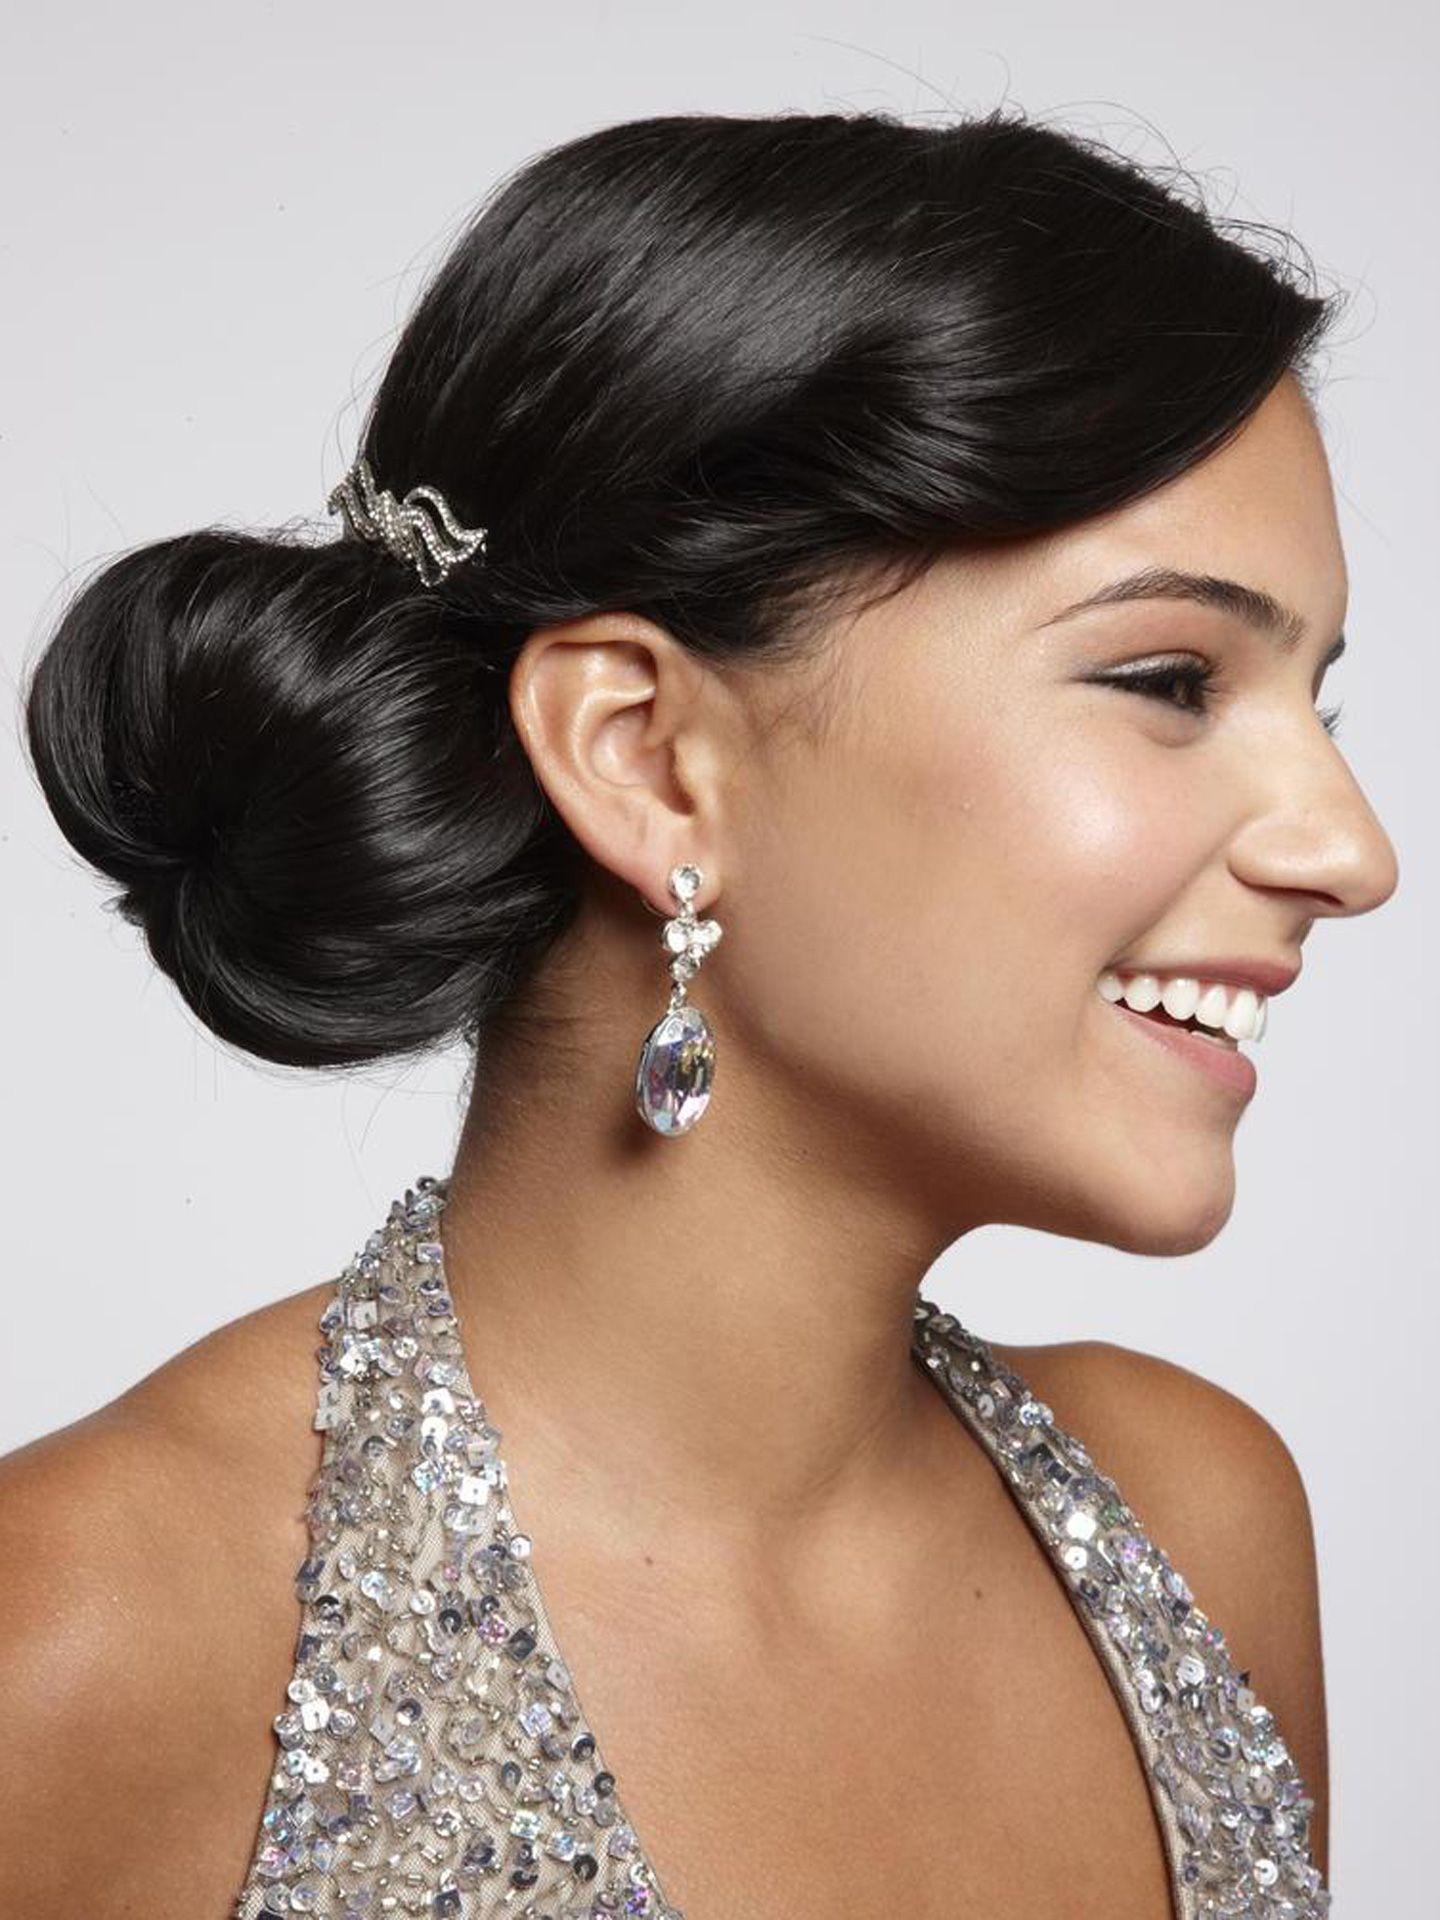 9 chignon hairstyles we love- chignon hair tutorials